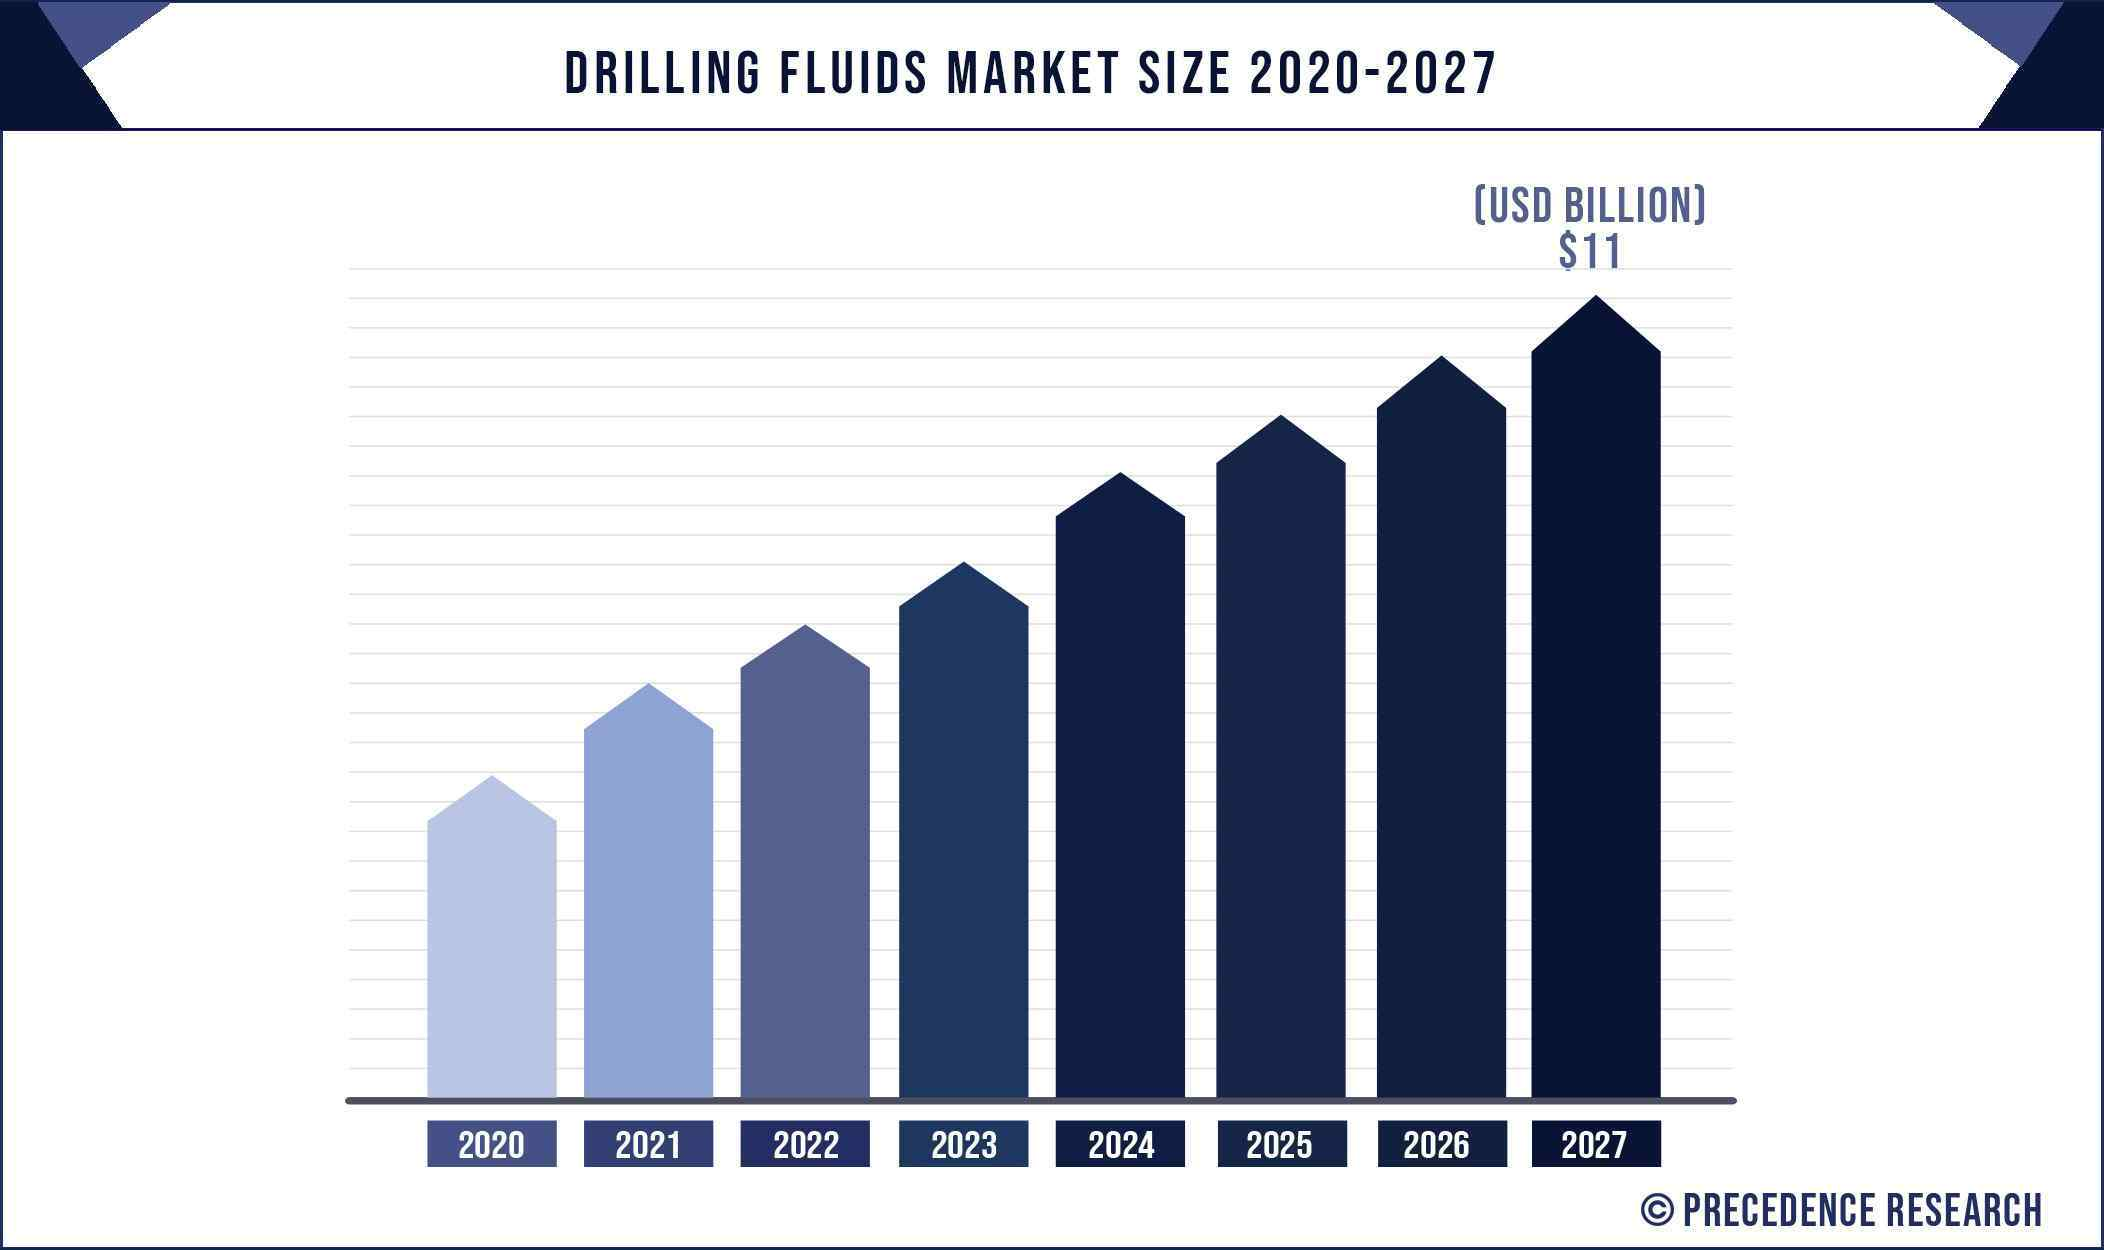 Drilling Fluids Market Size 2020 to 2027